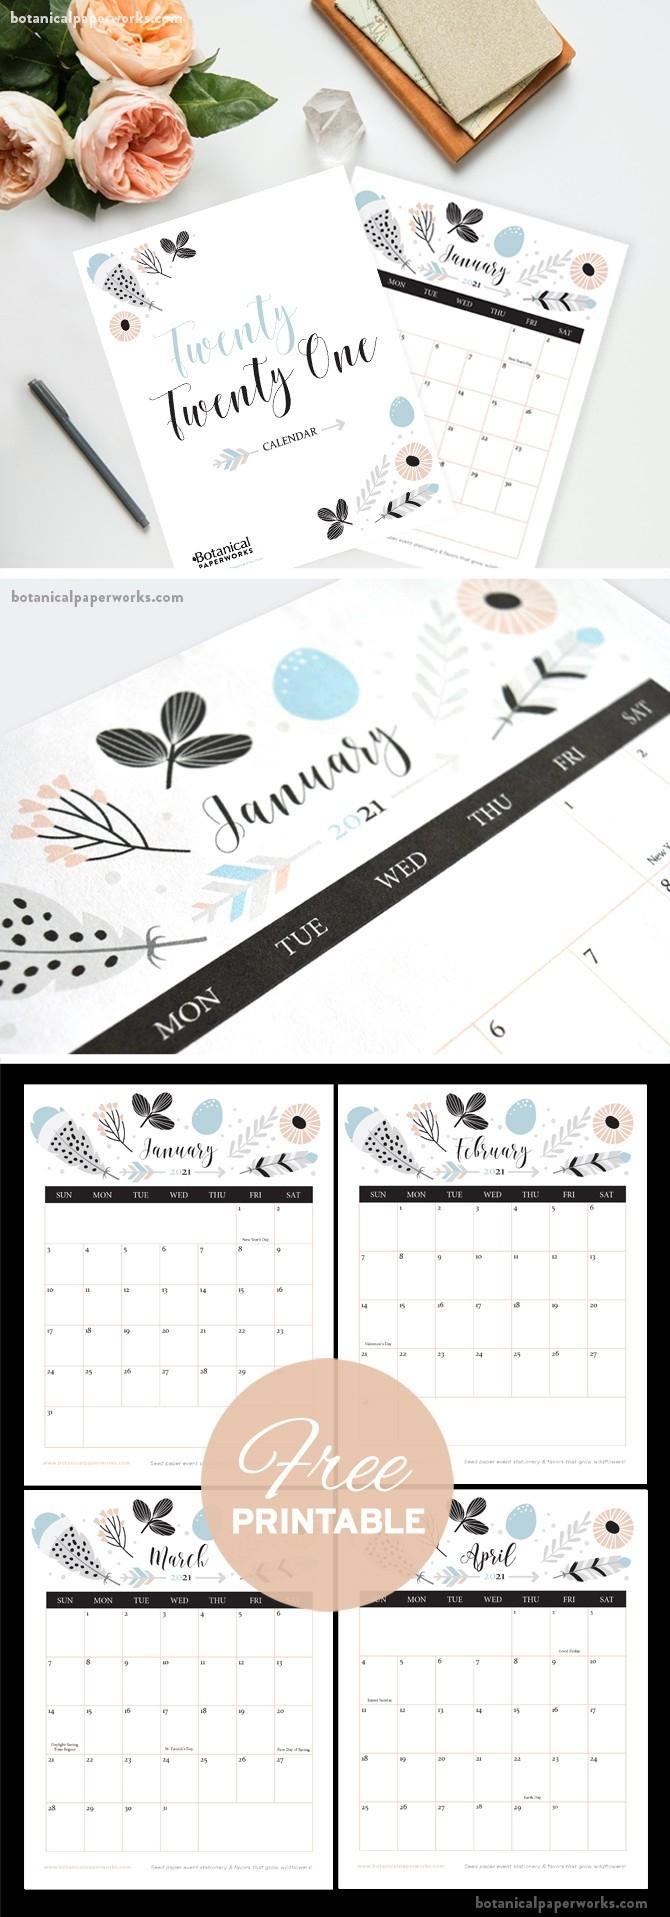 Free Printable 2021 Calendars | Botanical Paperworks-Printable I 9 Form Print 2021